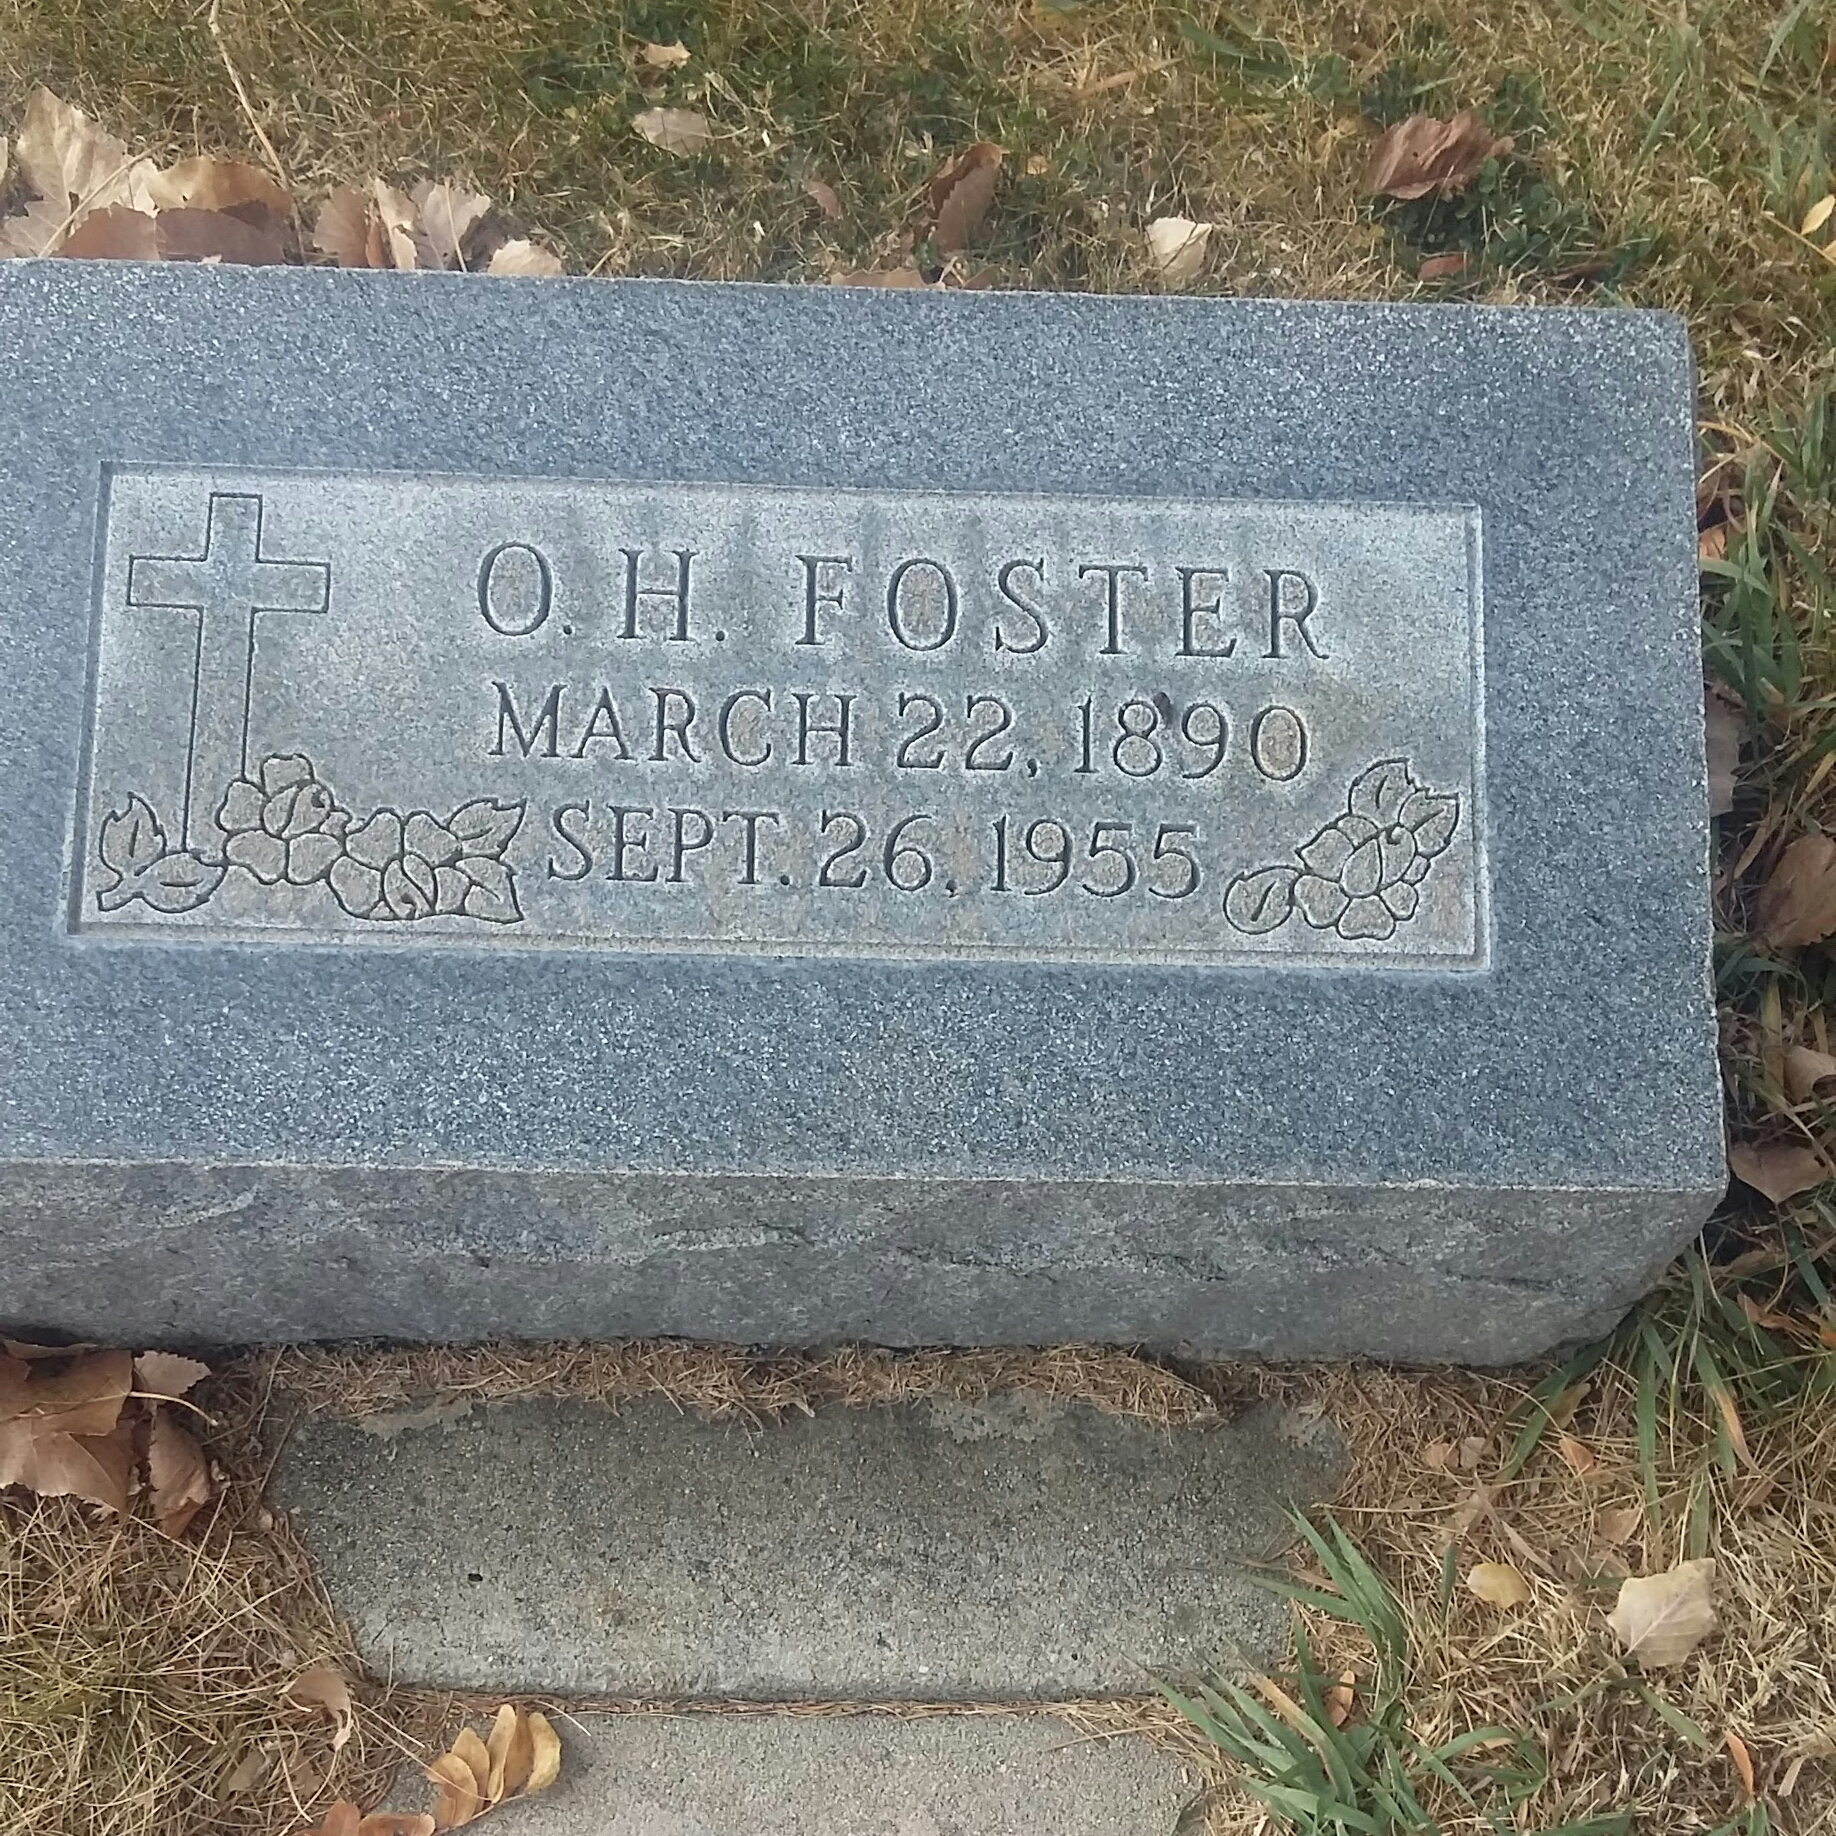 Otto Harrison Harry Foster